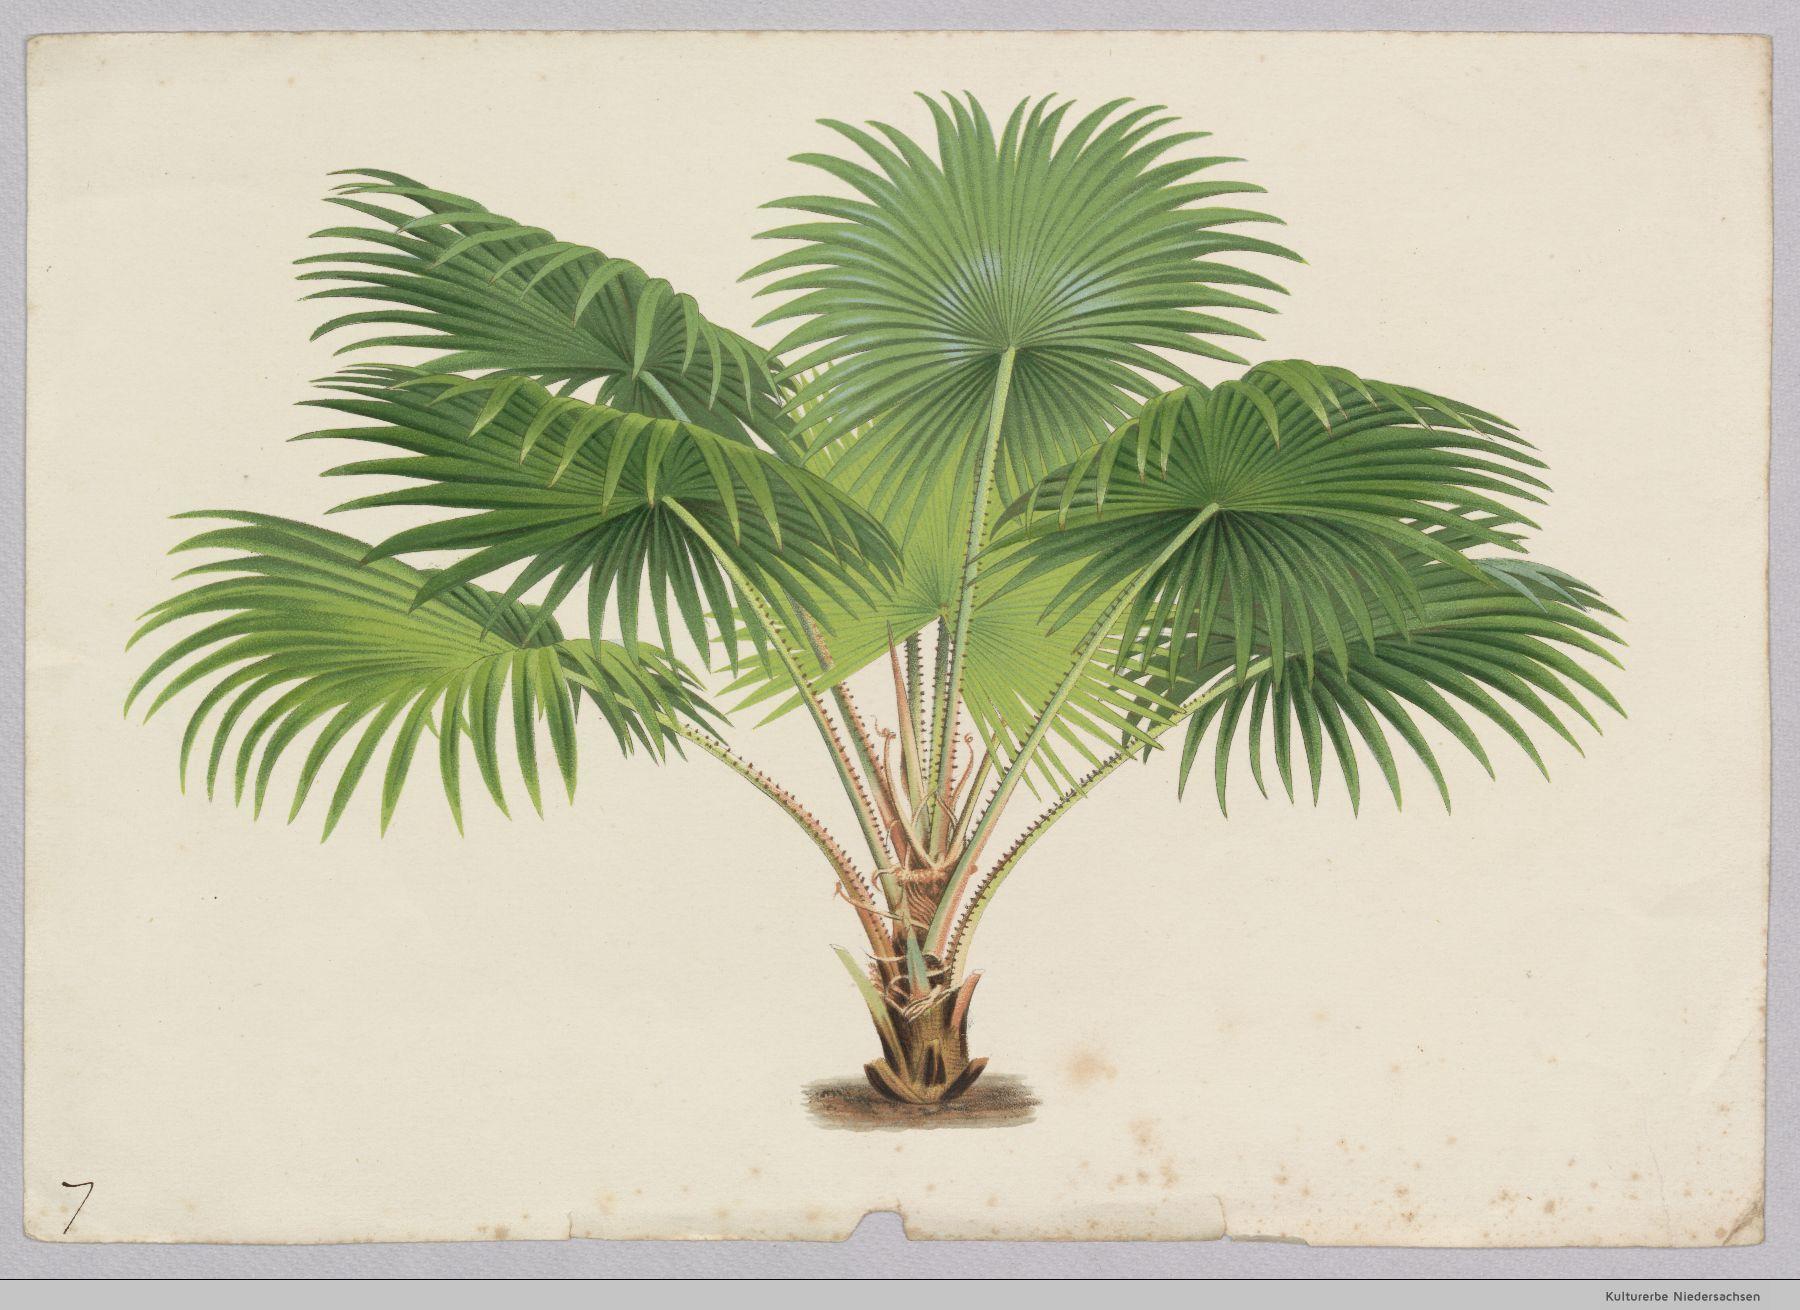 Pin de Heea en botanicals | Pinterest | Palmeras